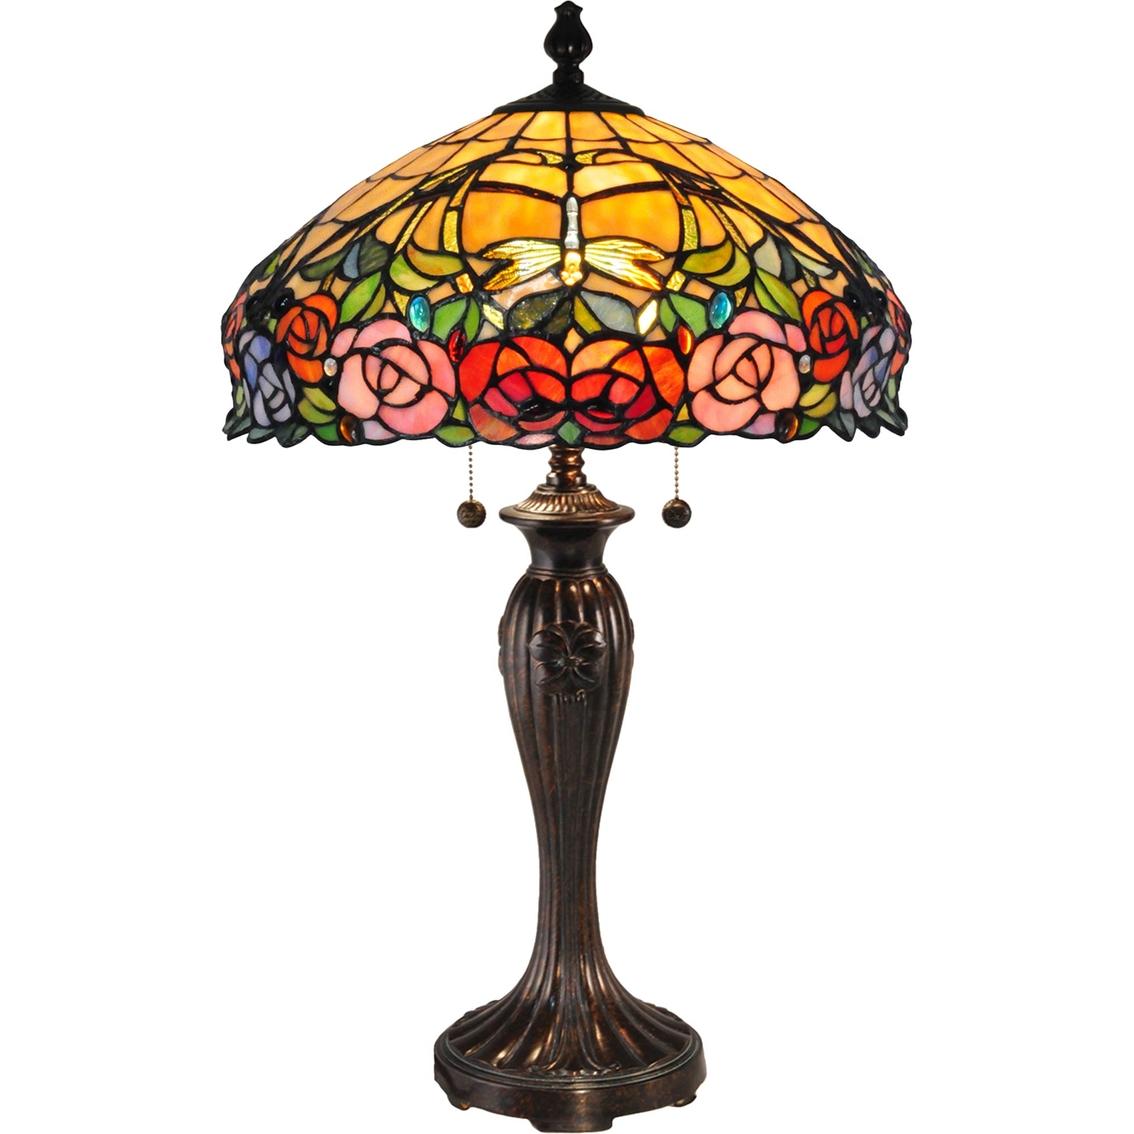 Dale Tiffany Zenia Rose Table Lamp | Lamps | Home & Appliances | Shop The Exchange